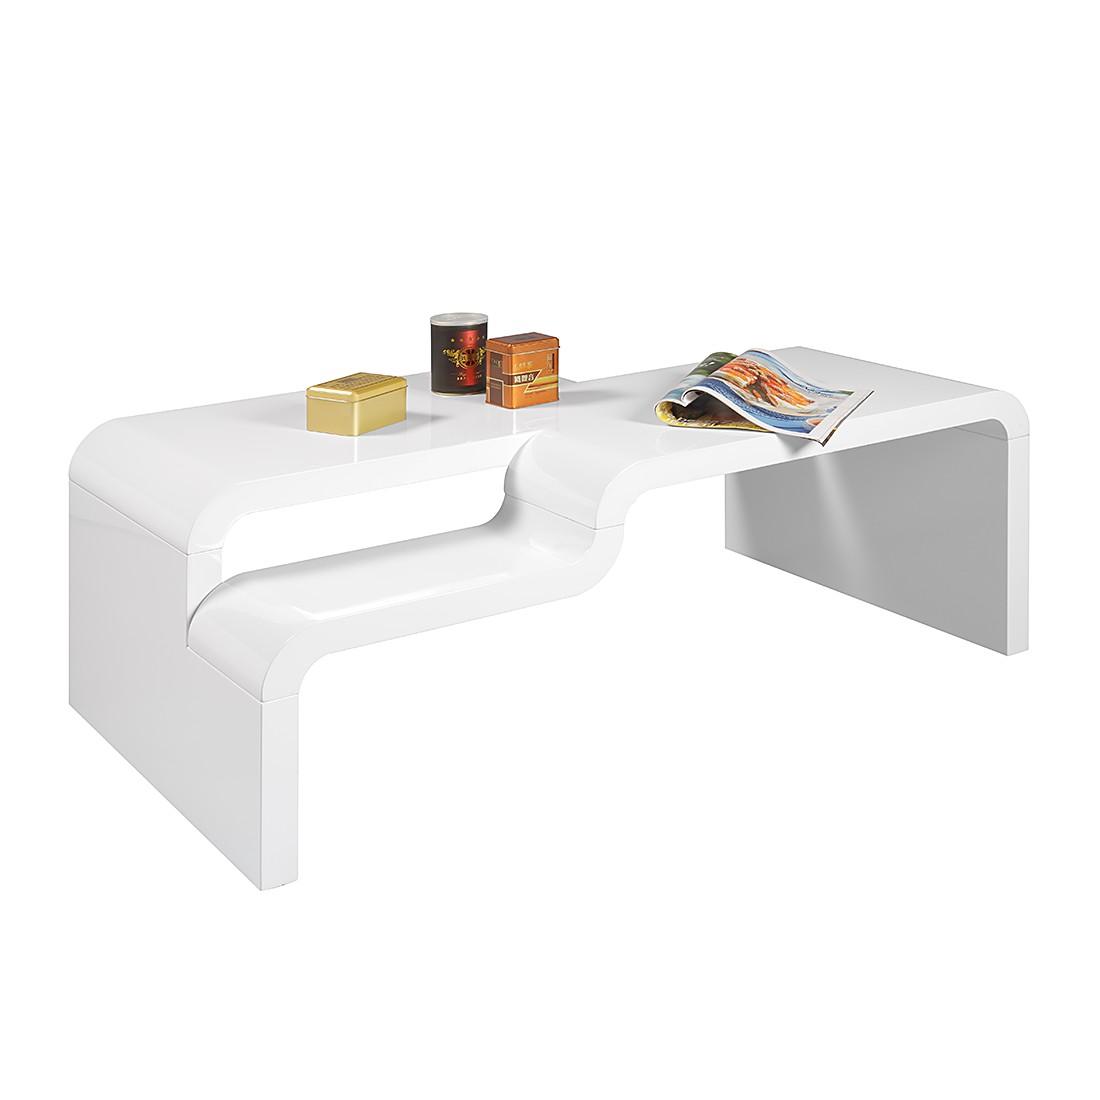 kleine meubels Salontafel Pedro - hoogglans wit HL Design voor 0.00 ...